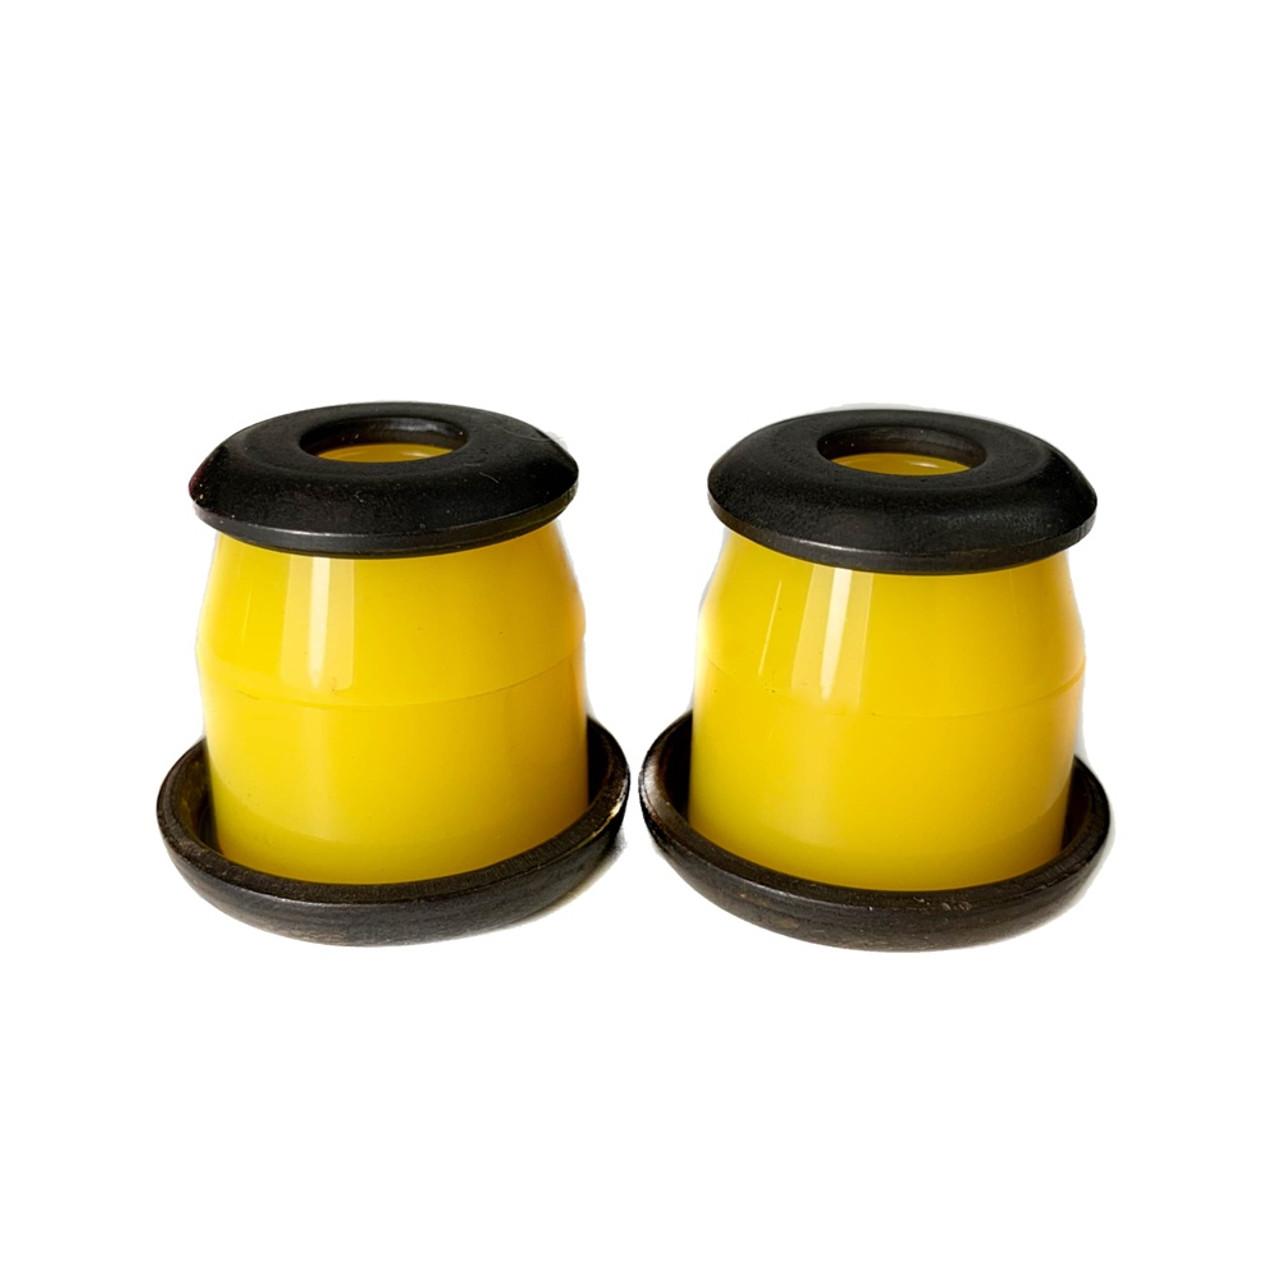 DSCO Skateboard Bushings Medium Yellow 88A